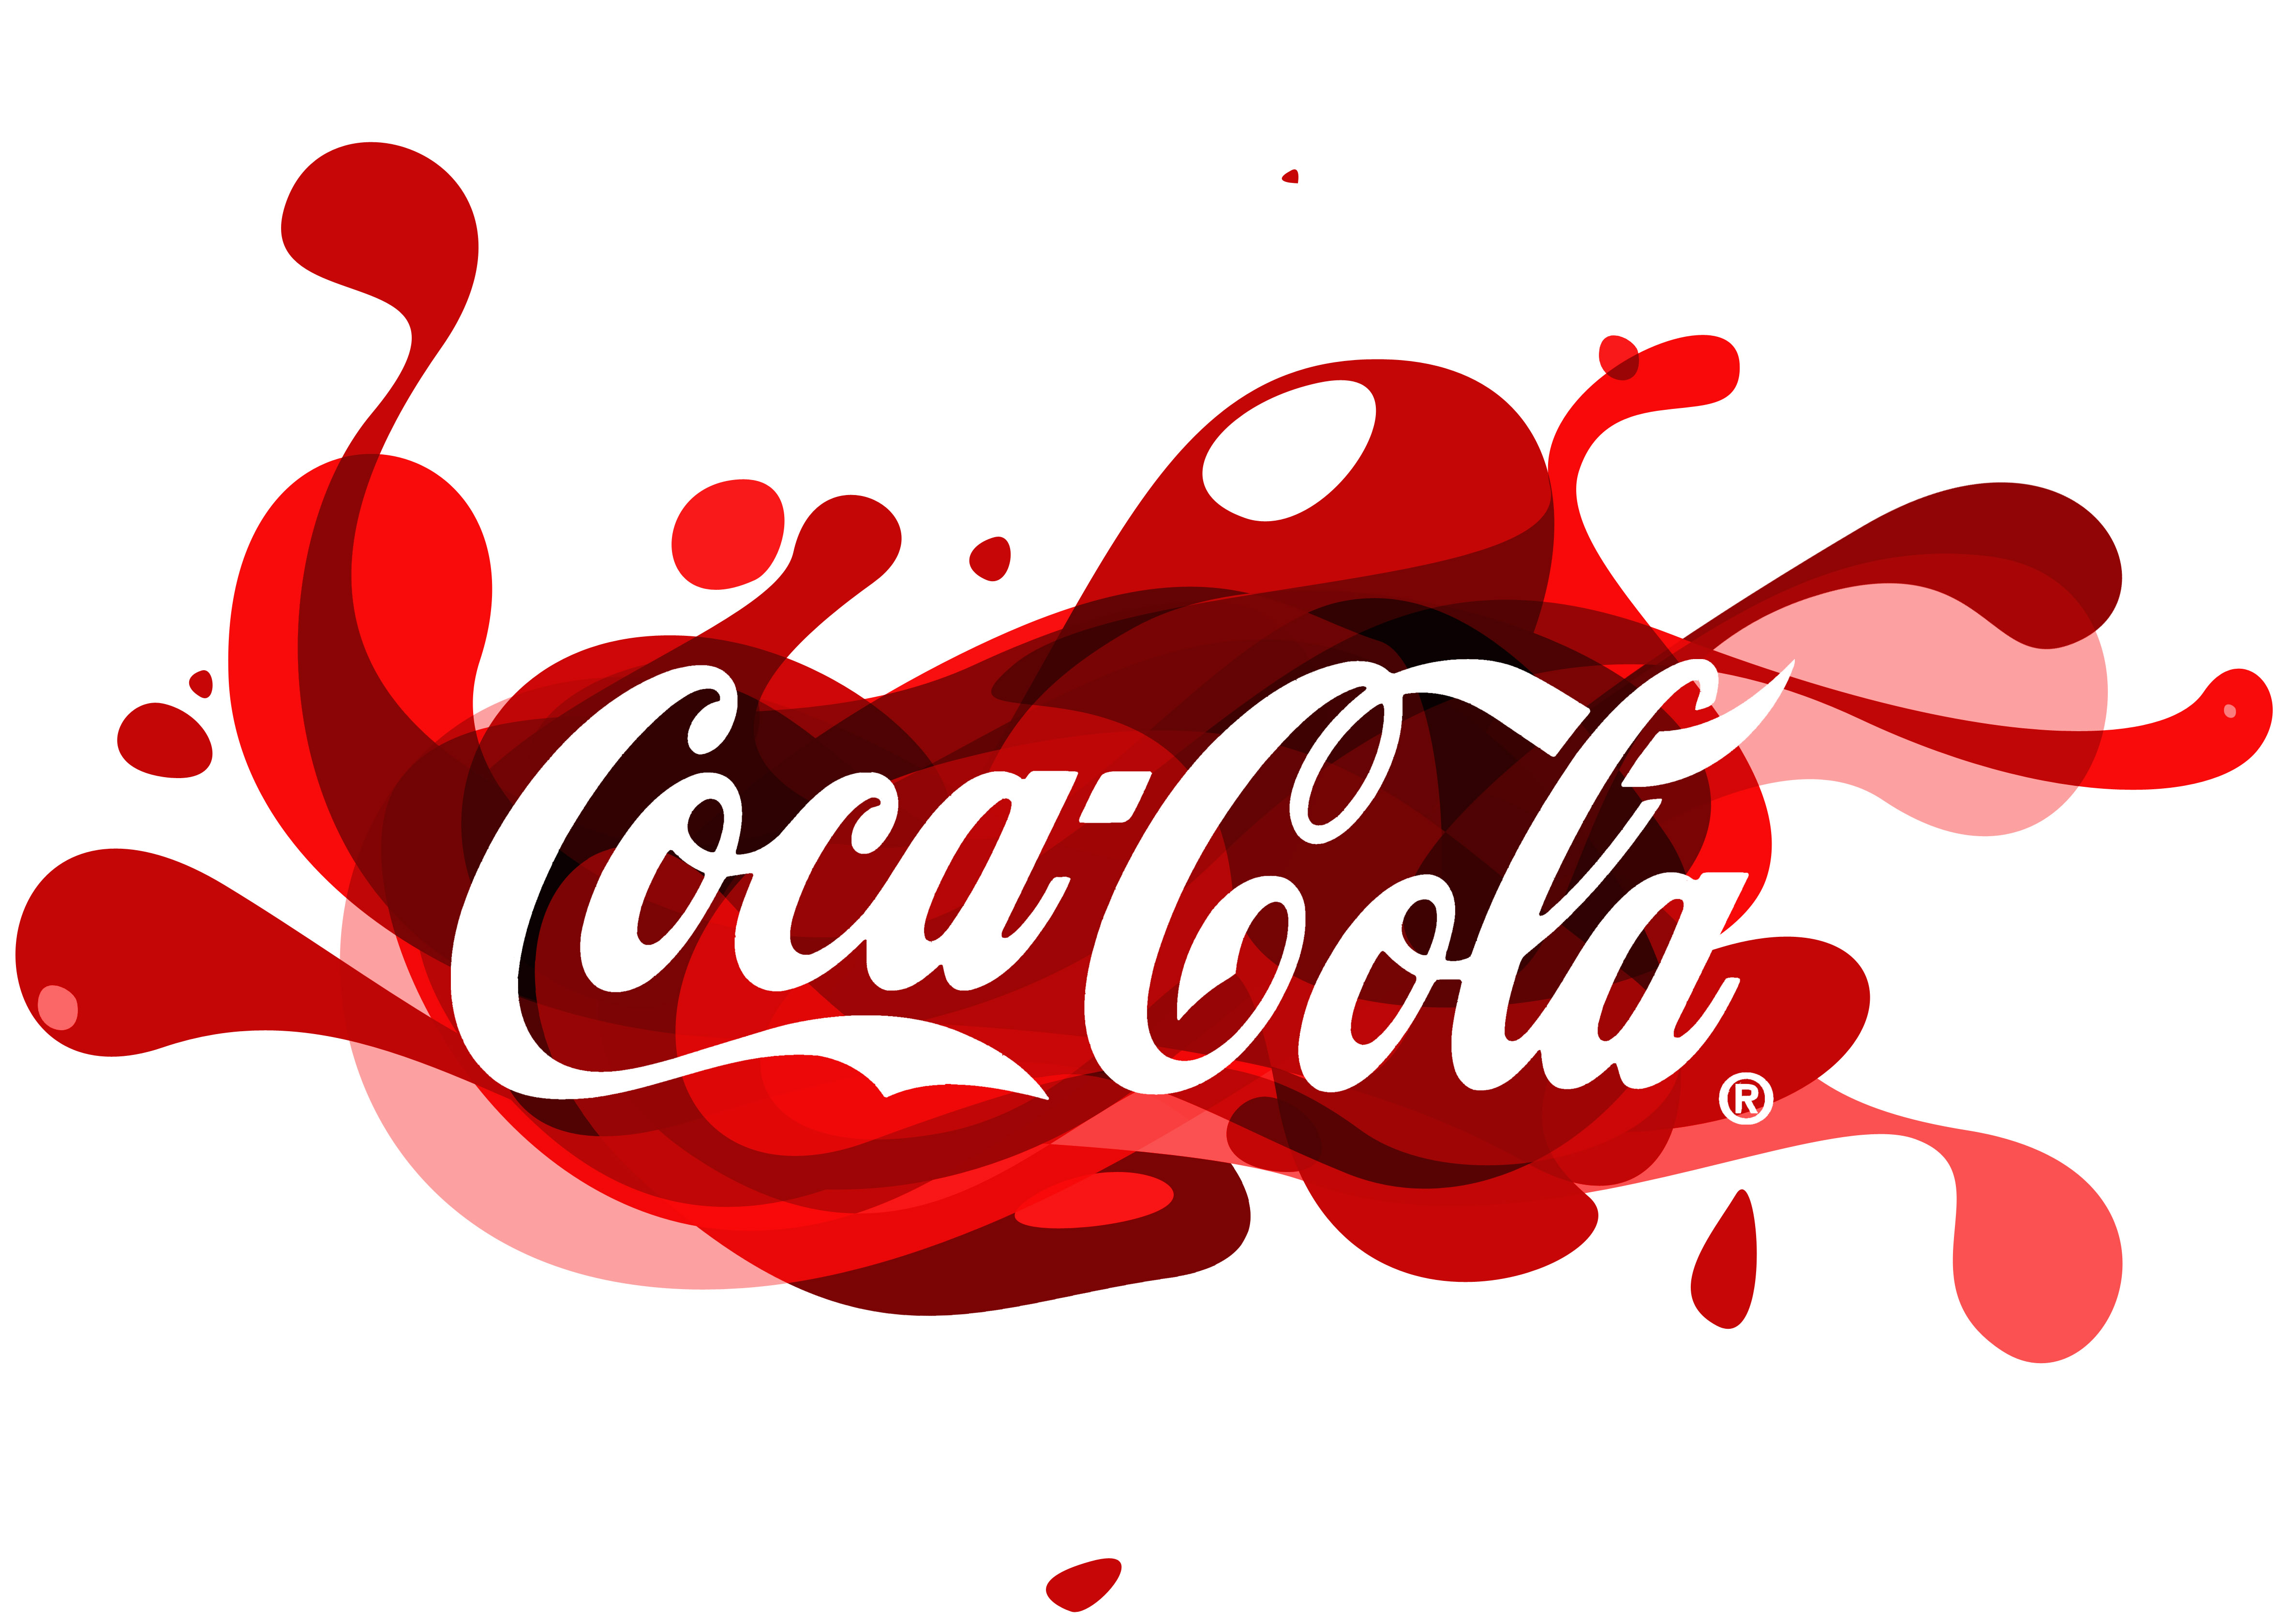 Alfa img - Showing > New Coca Cola Logo